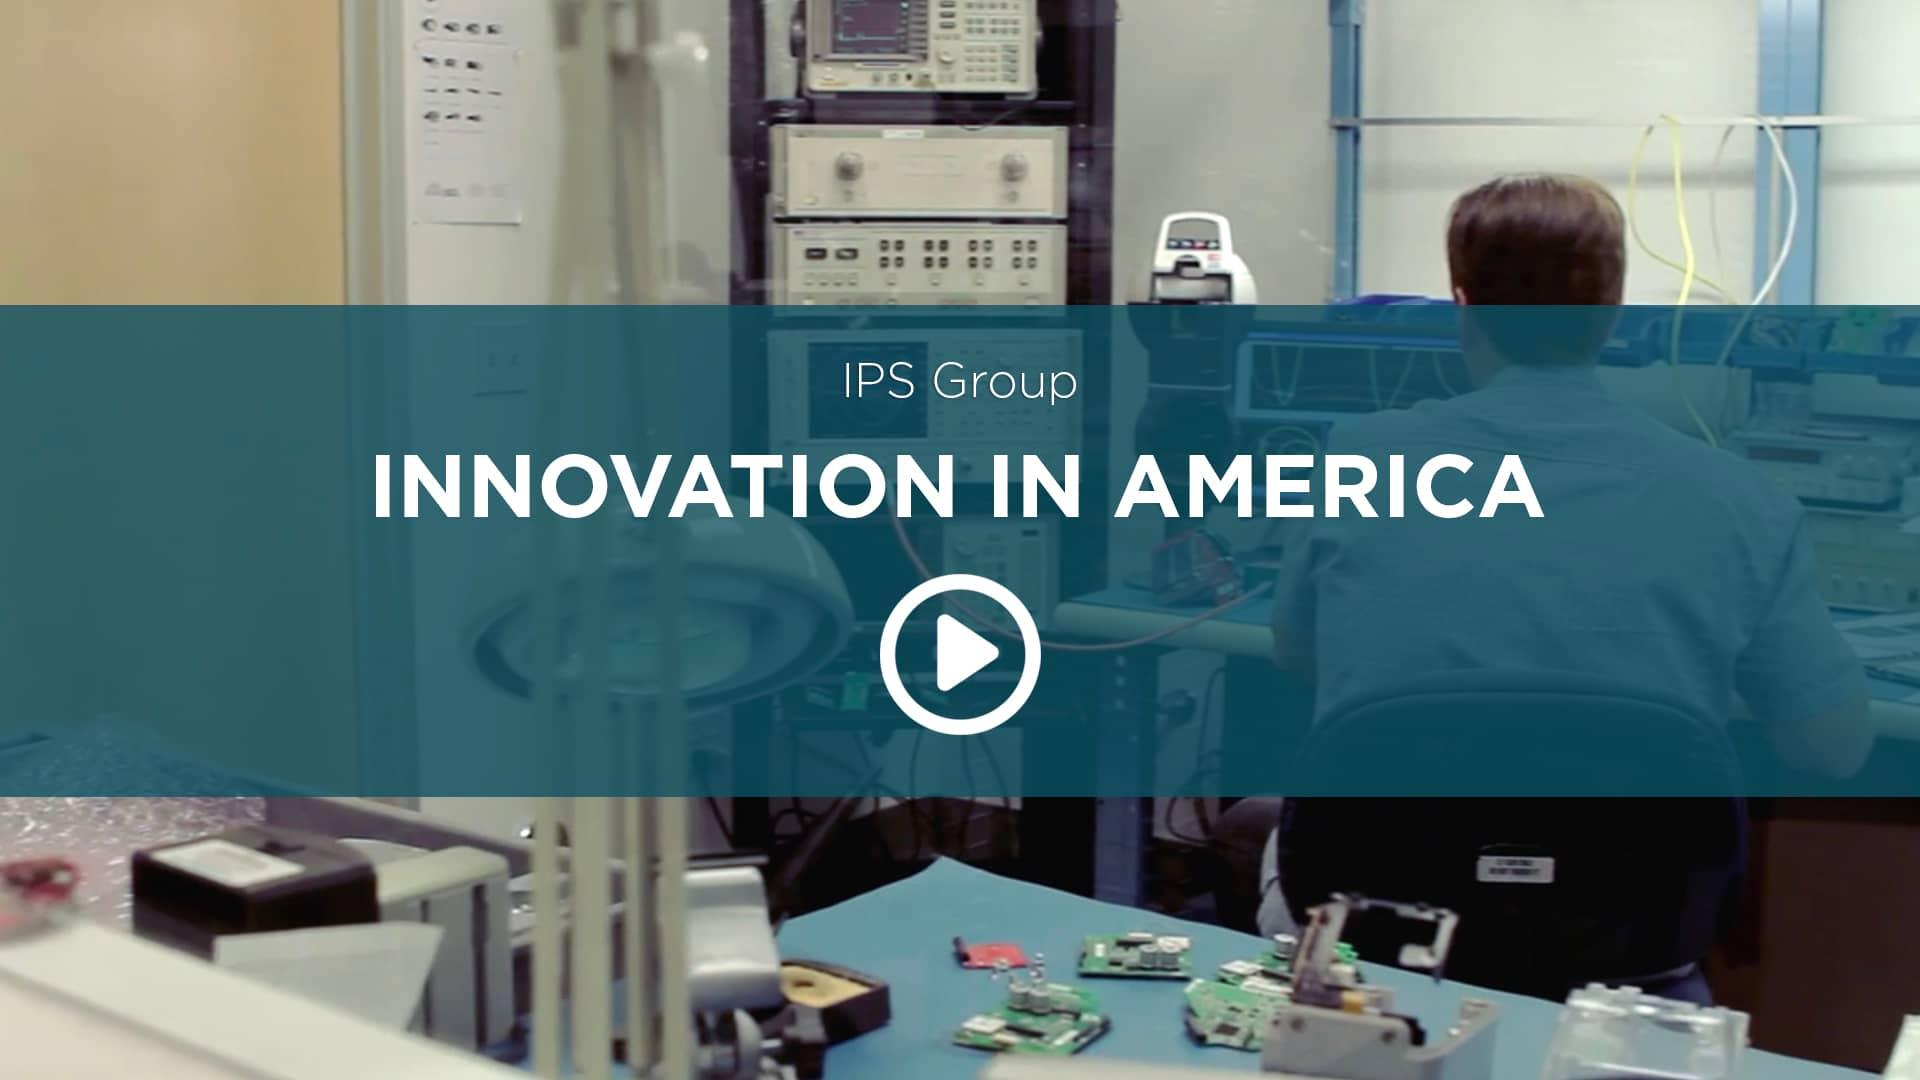 Innovation in America